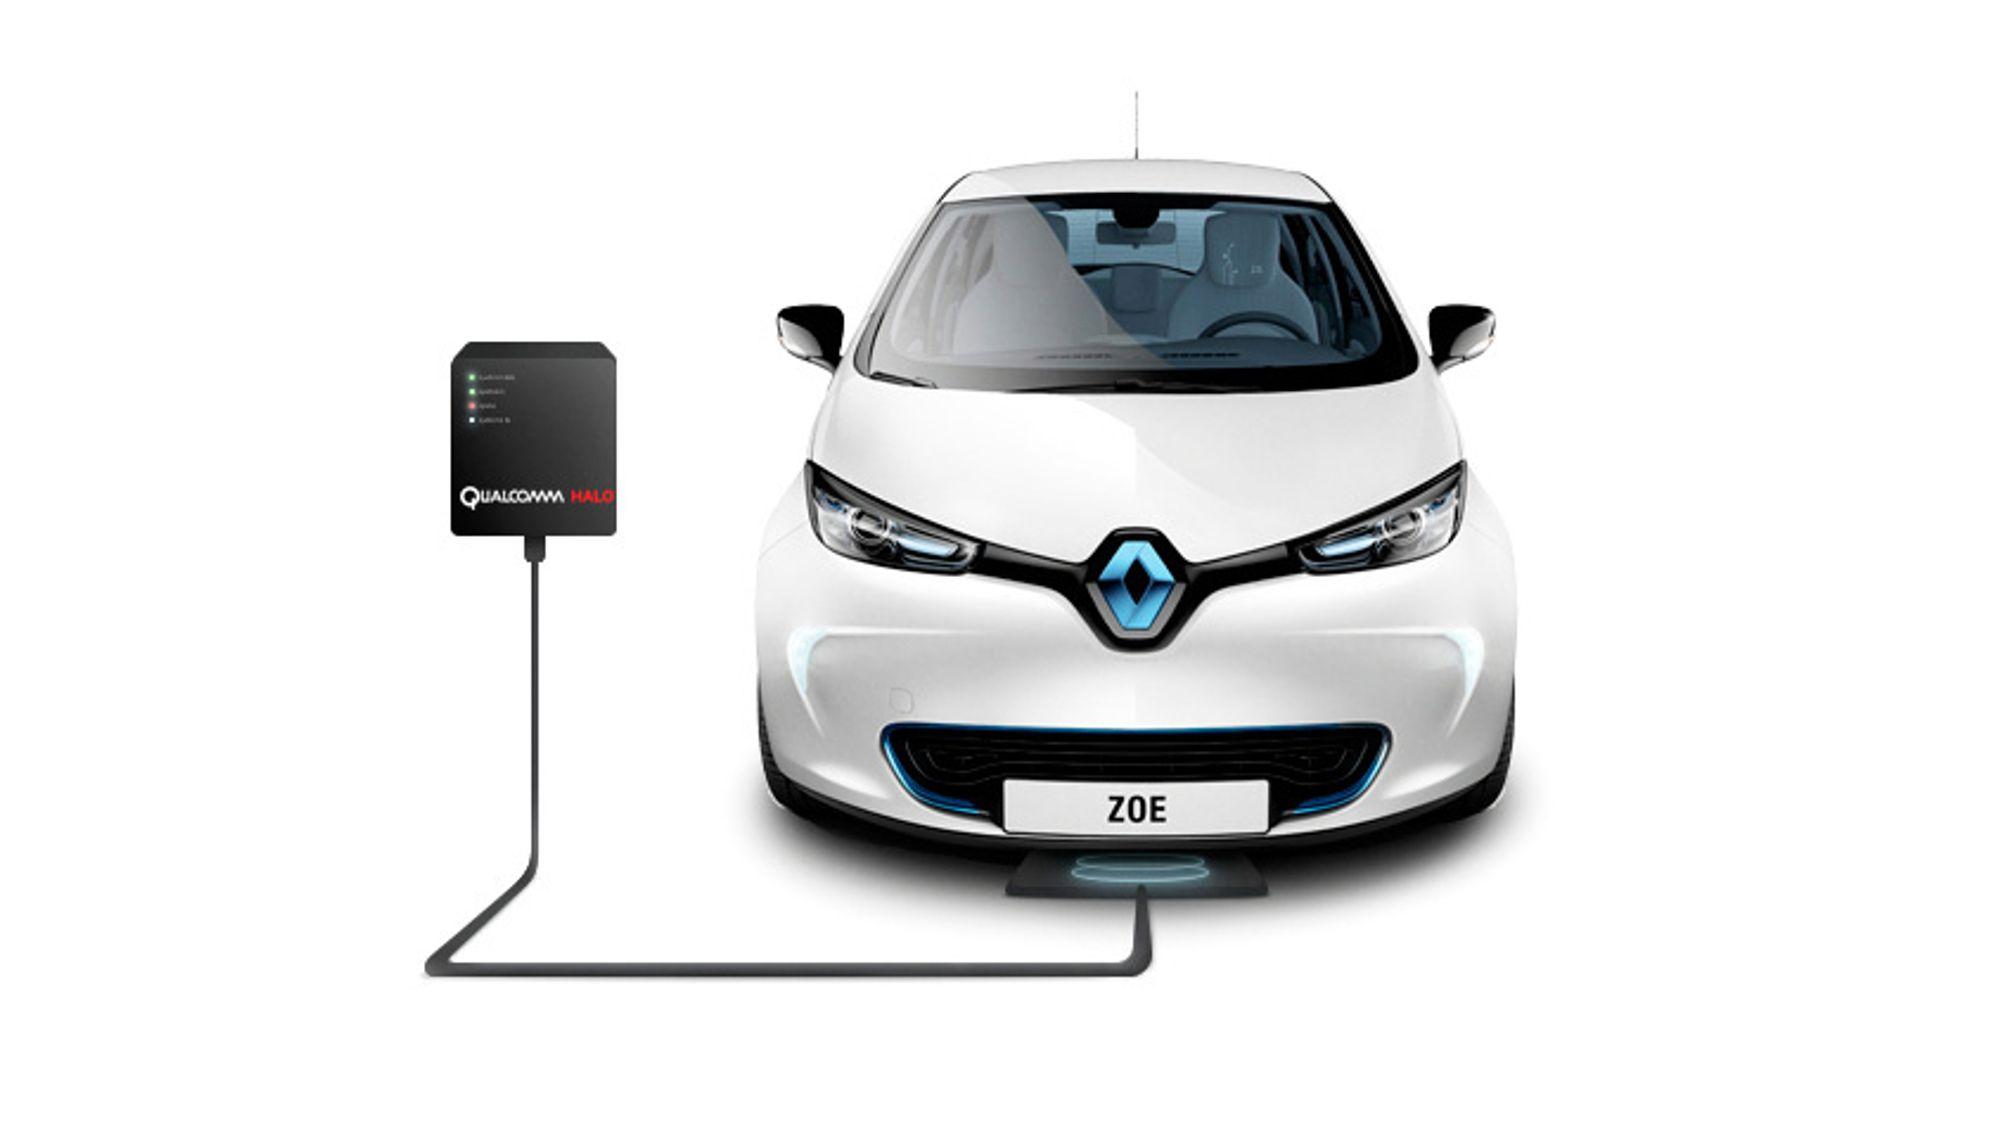 Oslo blir første by med trådløs elbil lading Tu.no